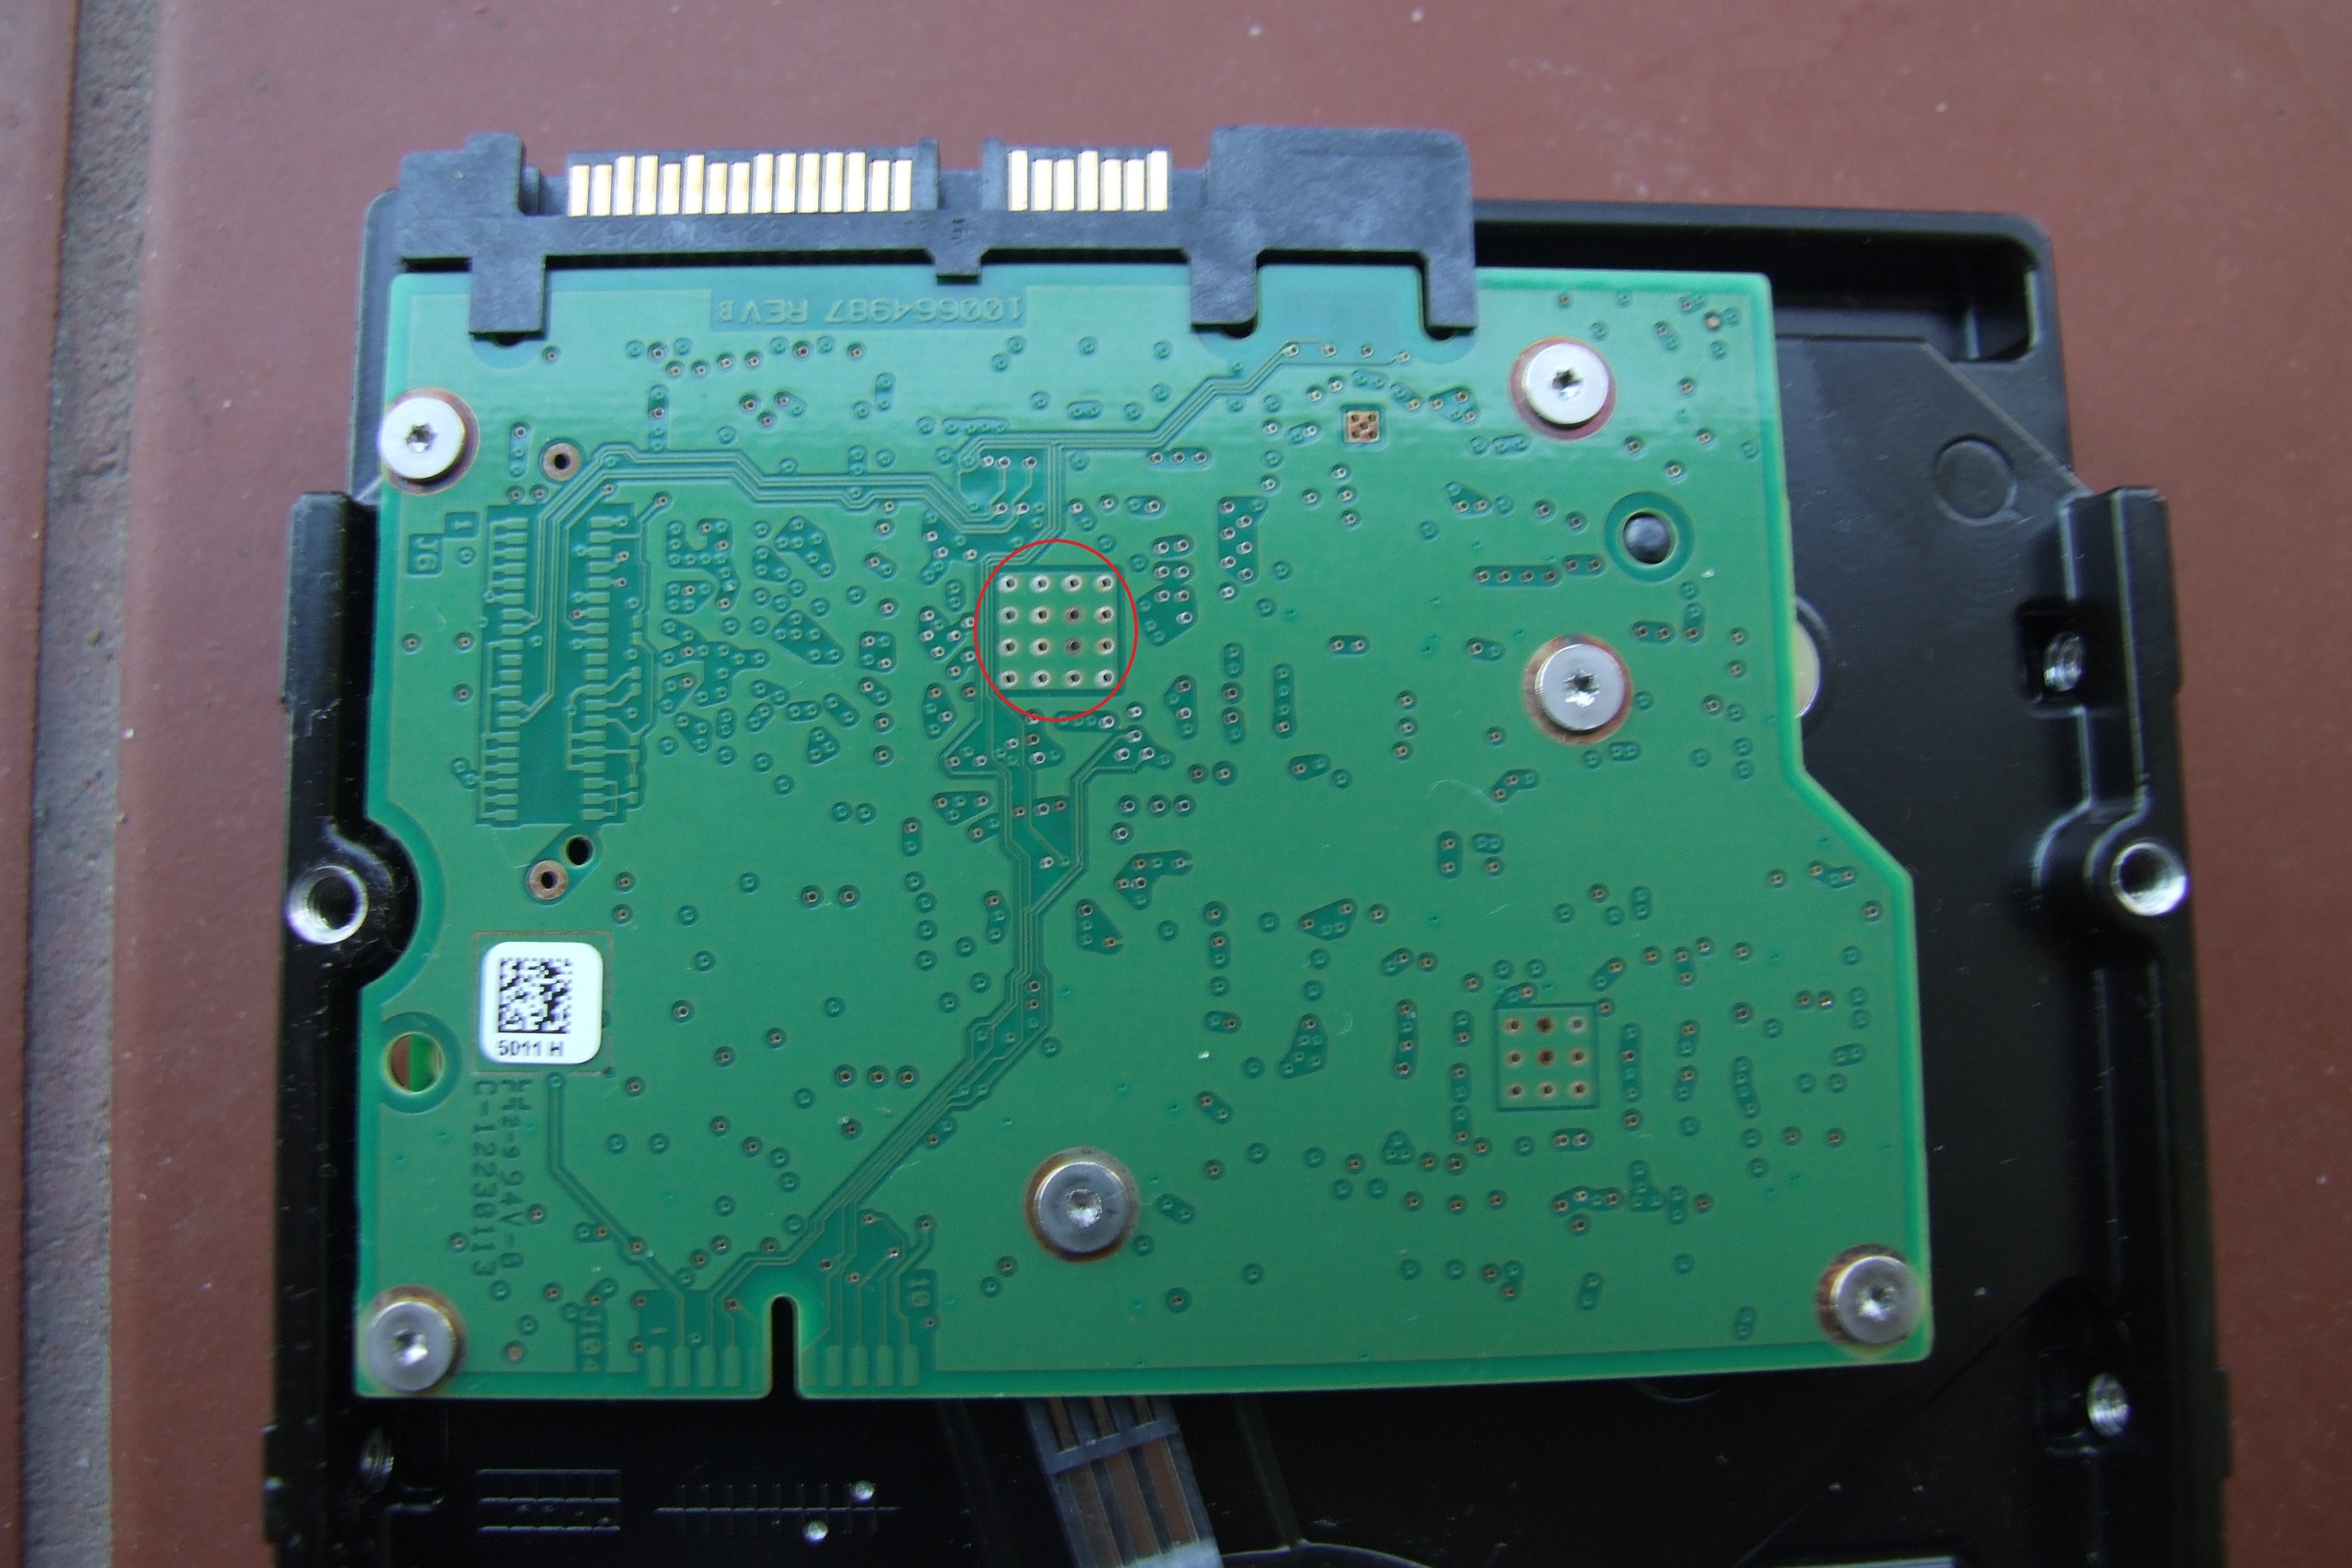 - Seagate Barracuda 2tb uszkodzona elektronika dysku?